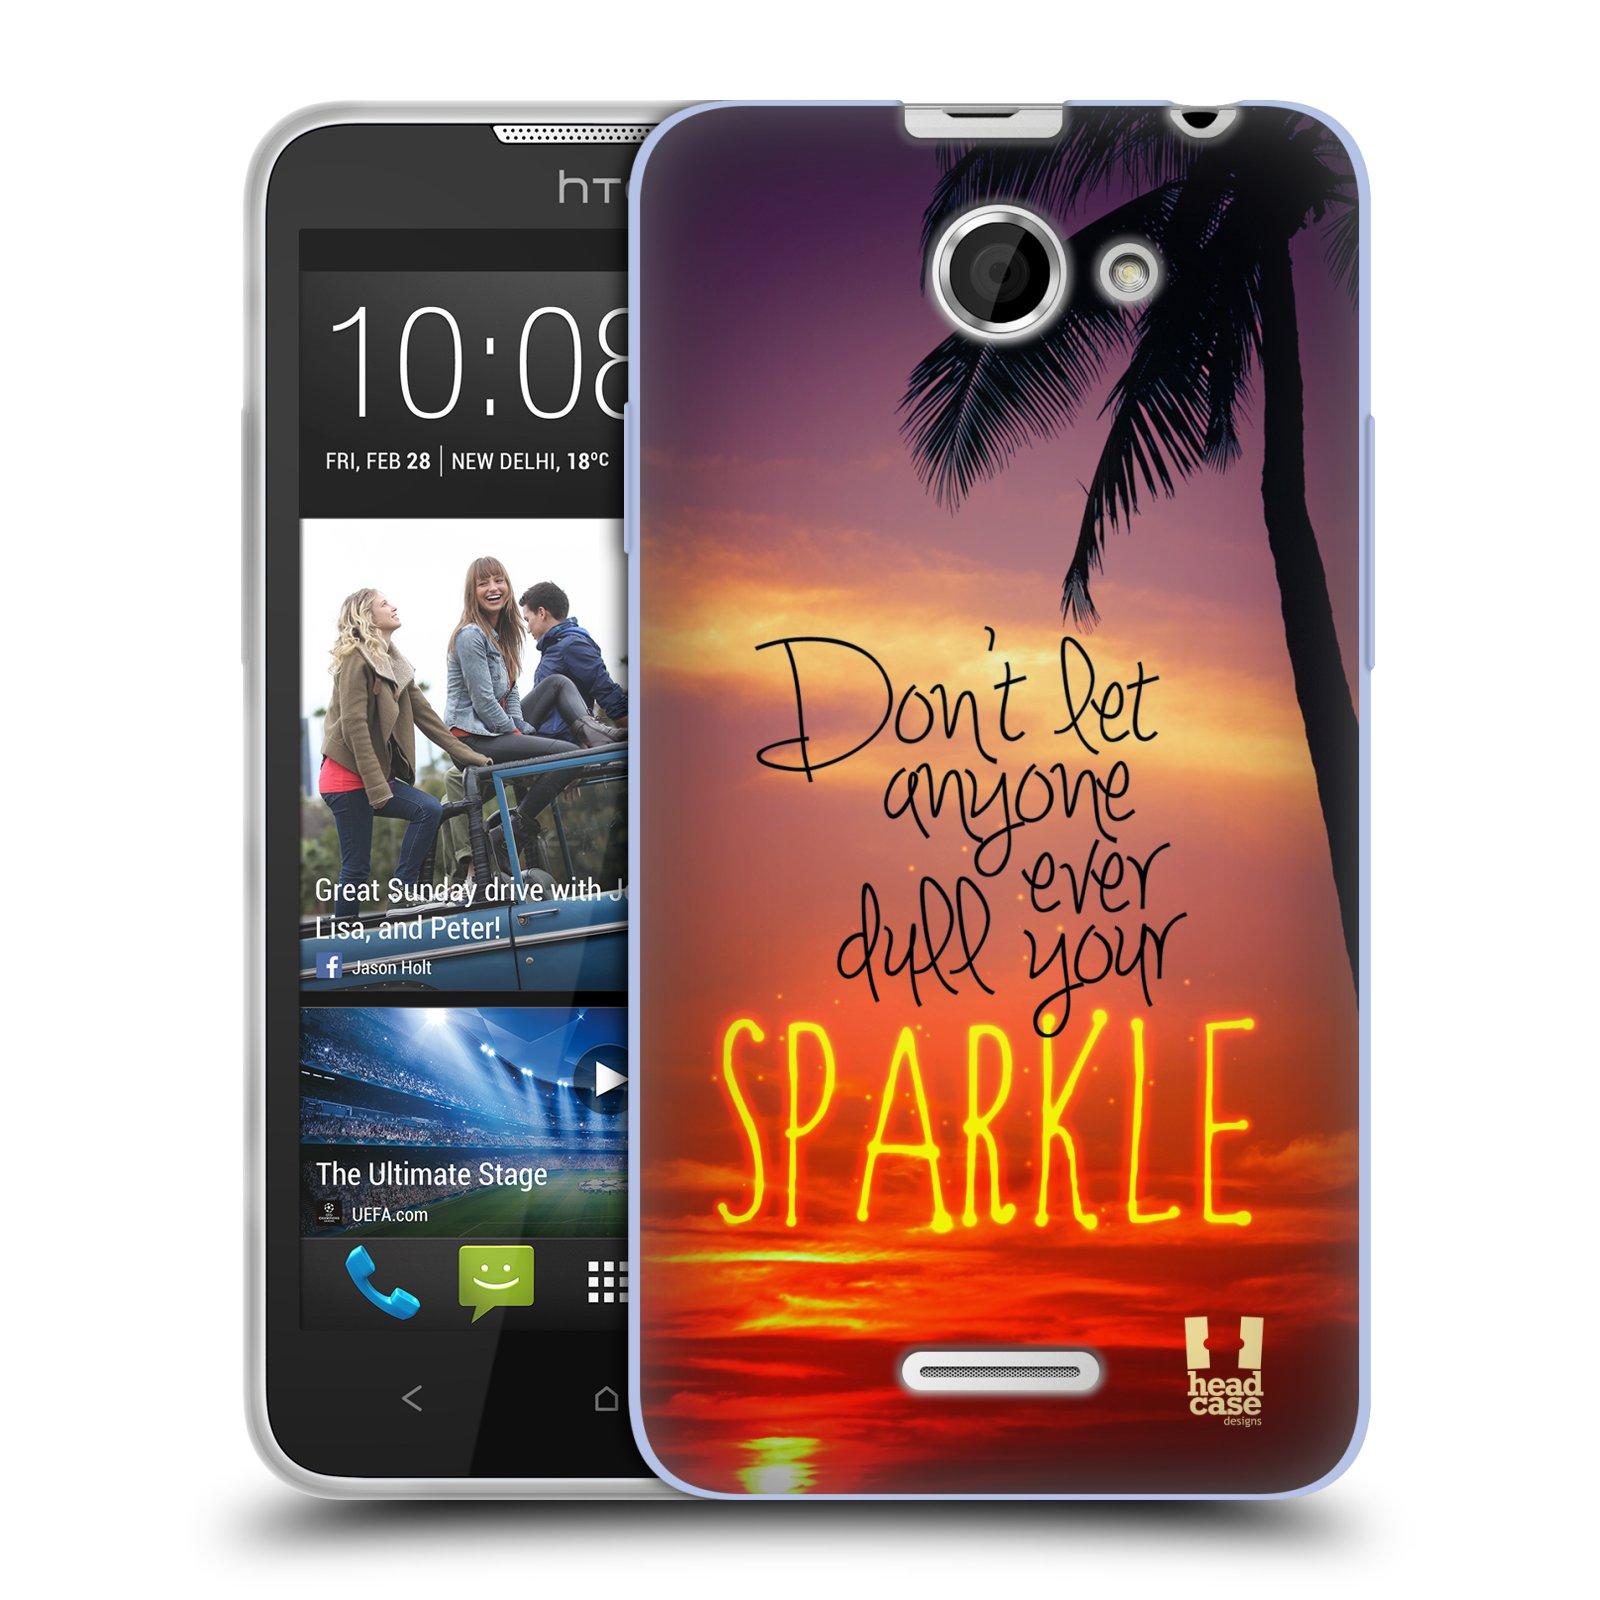 Silikonové pouzdro na mobil HTC Desire 516 HEAD CASE SPARKLE (Silikonový kryt či obal na mobilní telefon HTC Desire 516 Dual SIM)